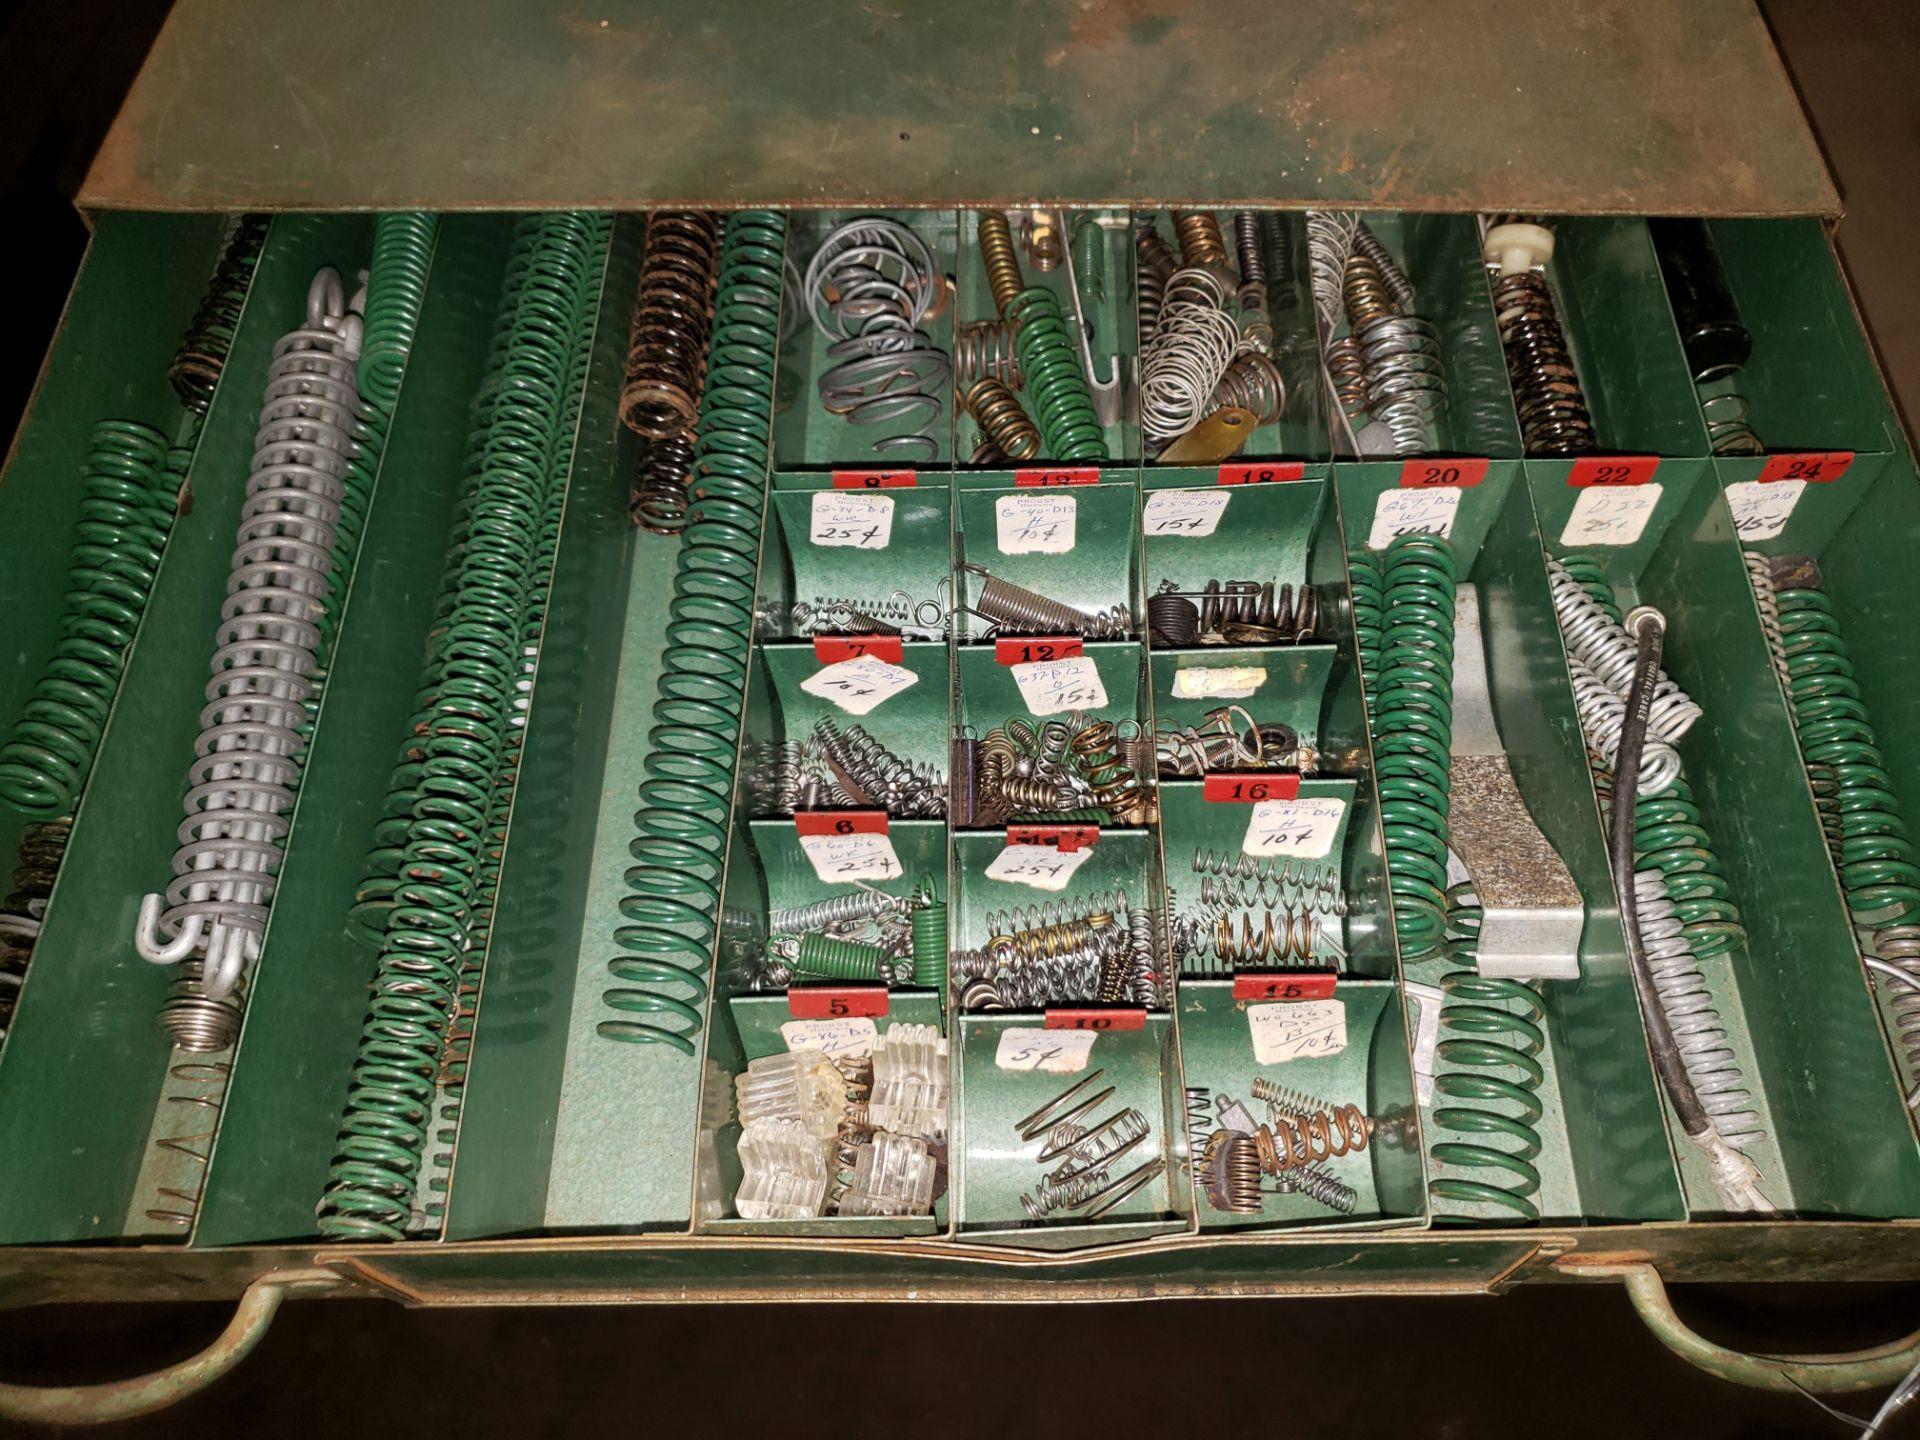 Lot 998 - SPRINGS IN 2 DRAWER METAL STORAGE CASE